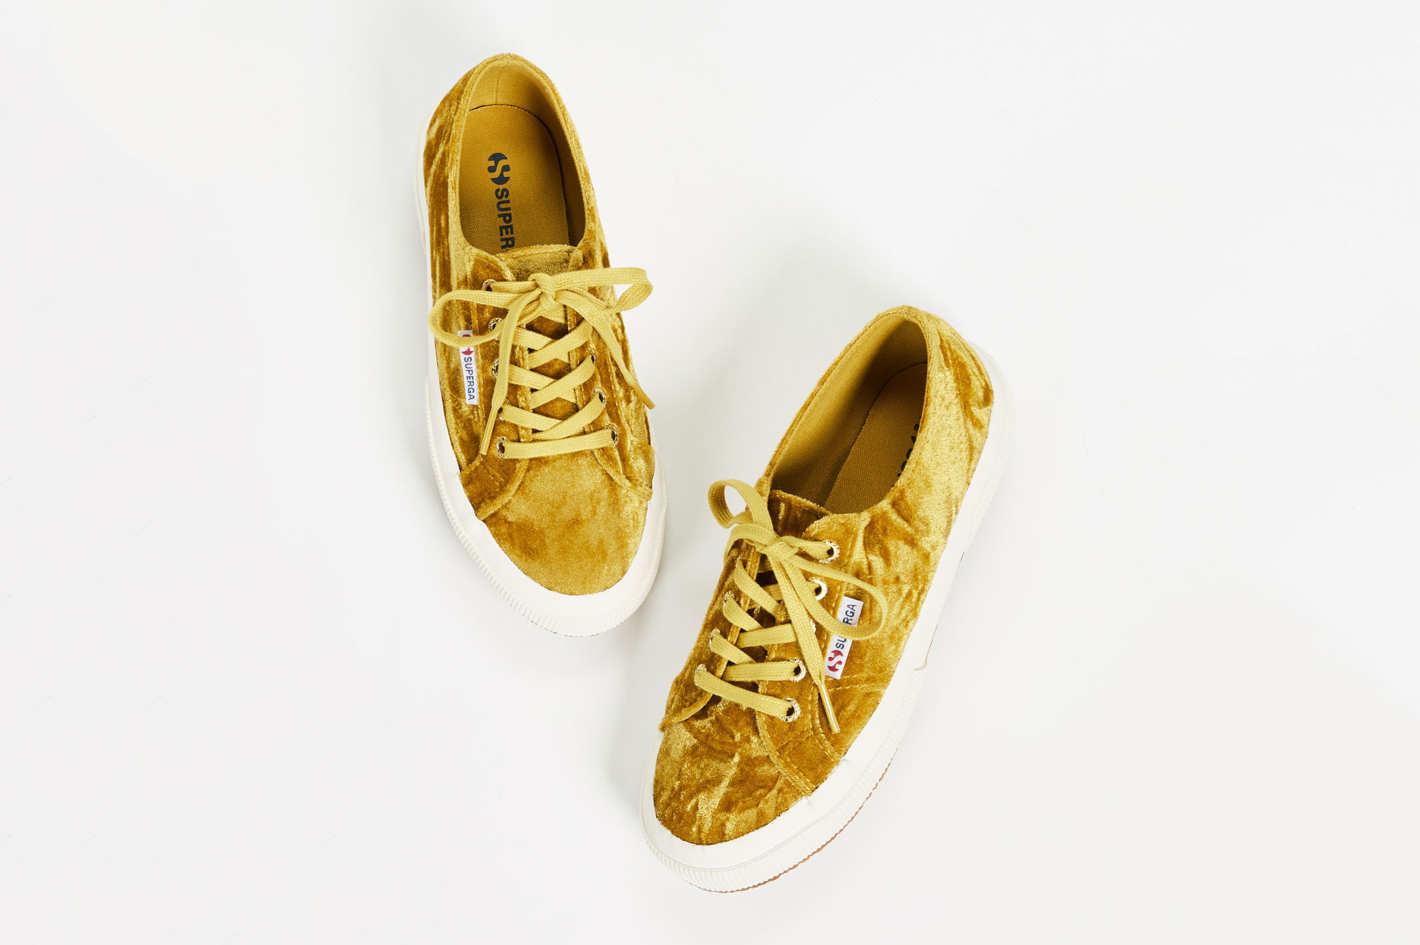 Superga 2750 Crushed Velvet Laceup Sneakers